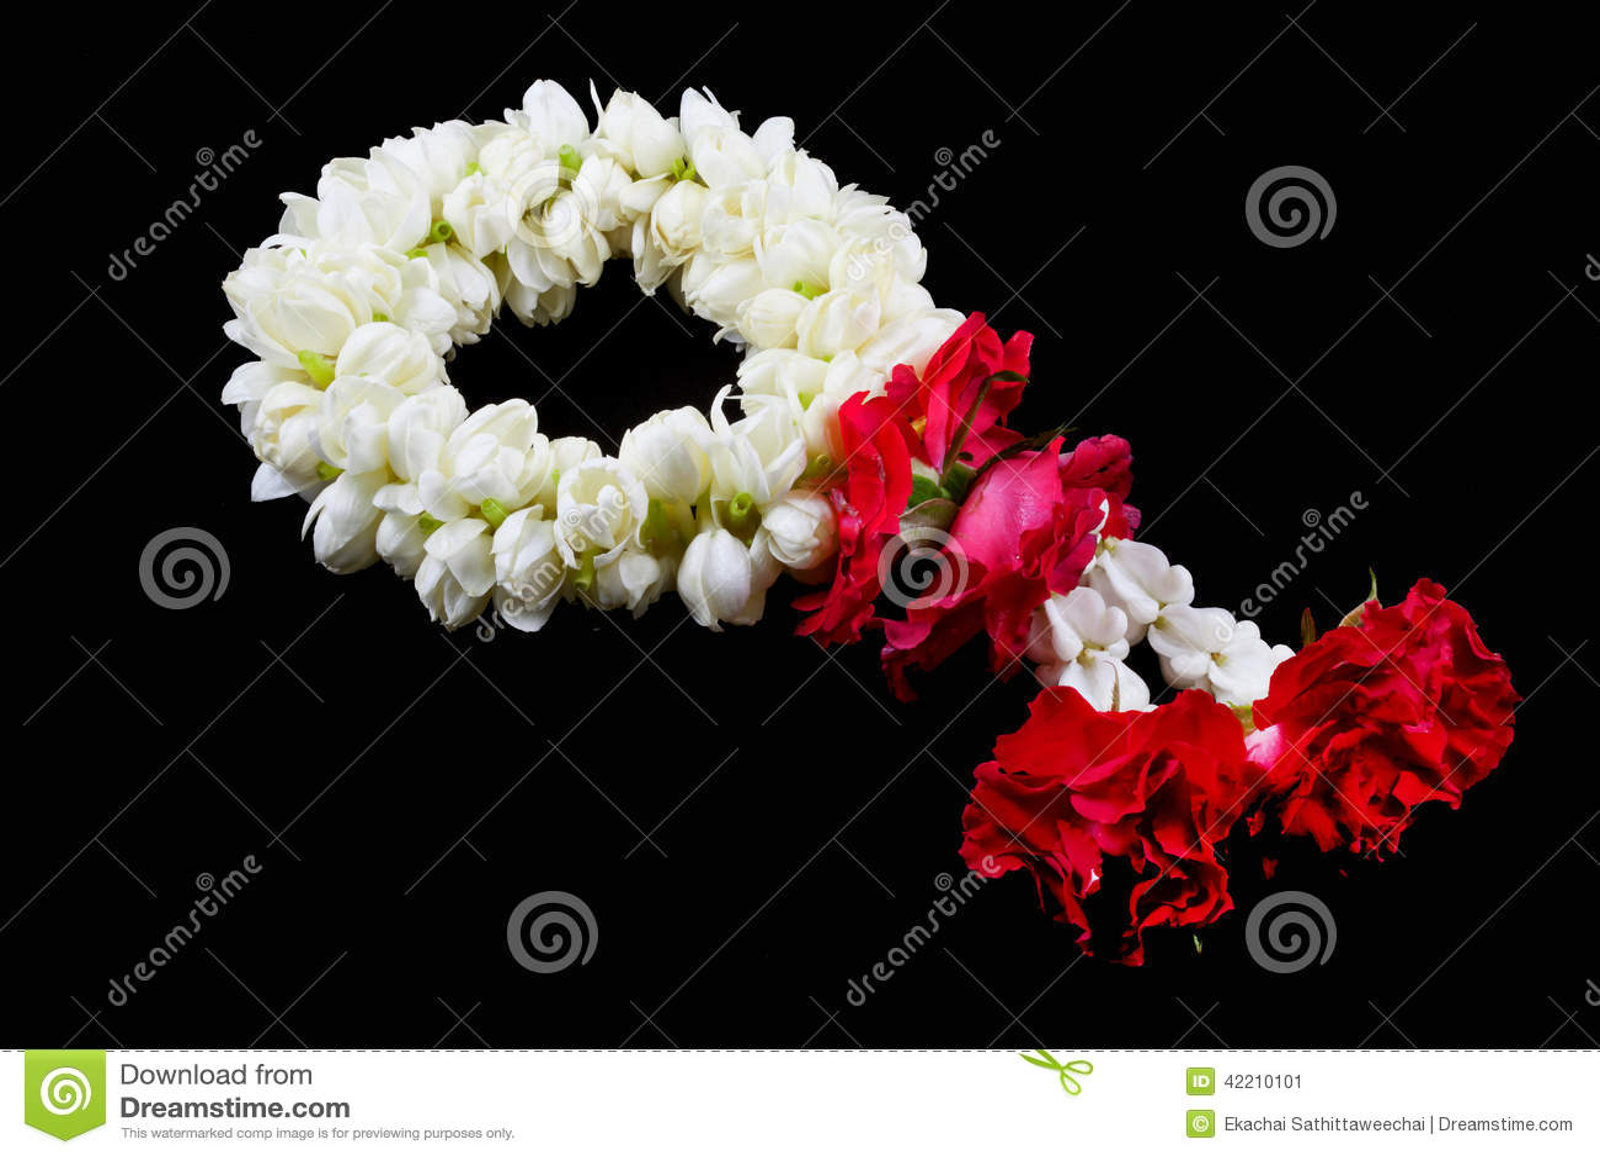 Pin India Jasmine Flower Garland Images To Pinterest